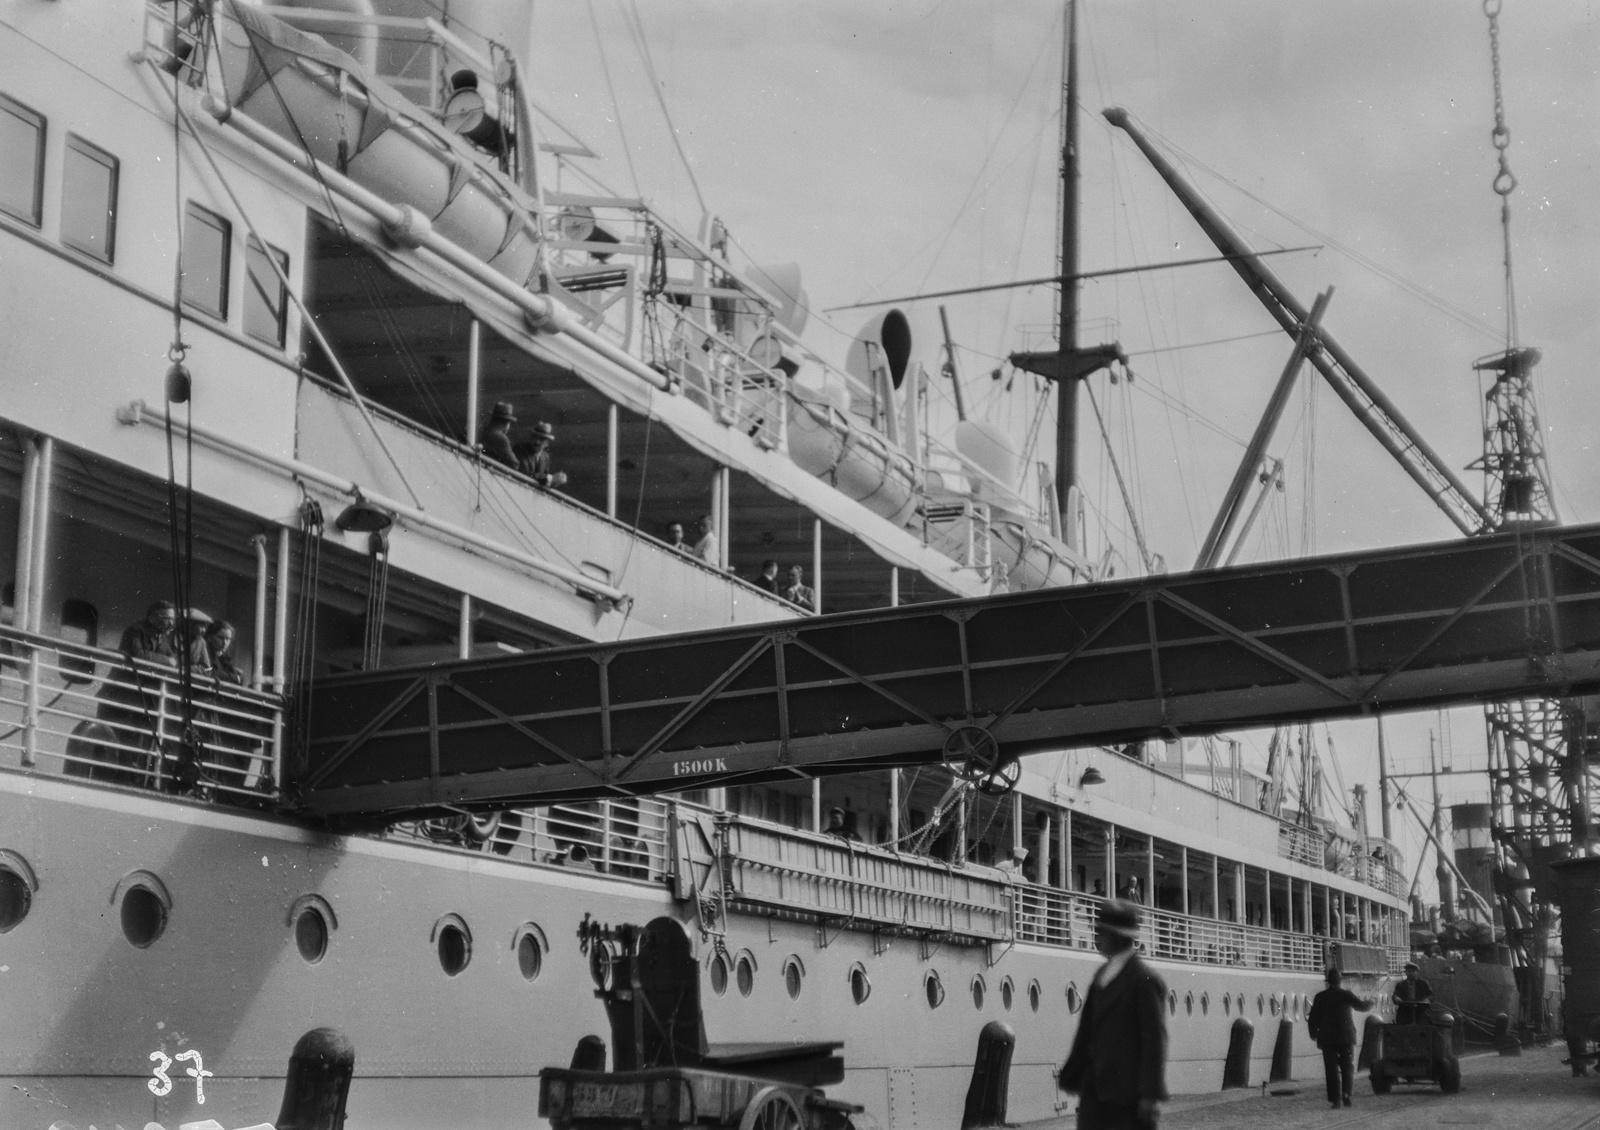 Антверпен. Корабль экспедиции